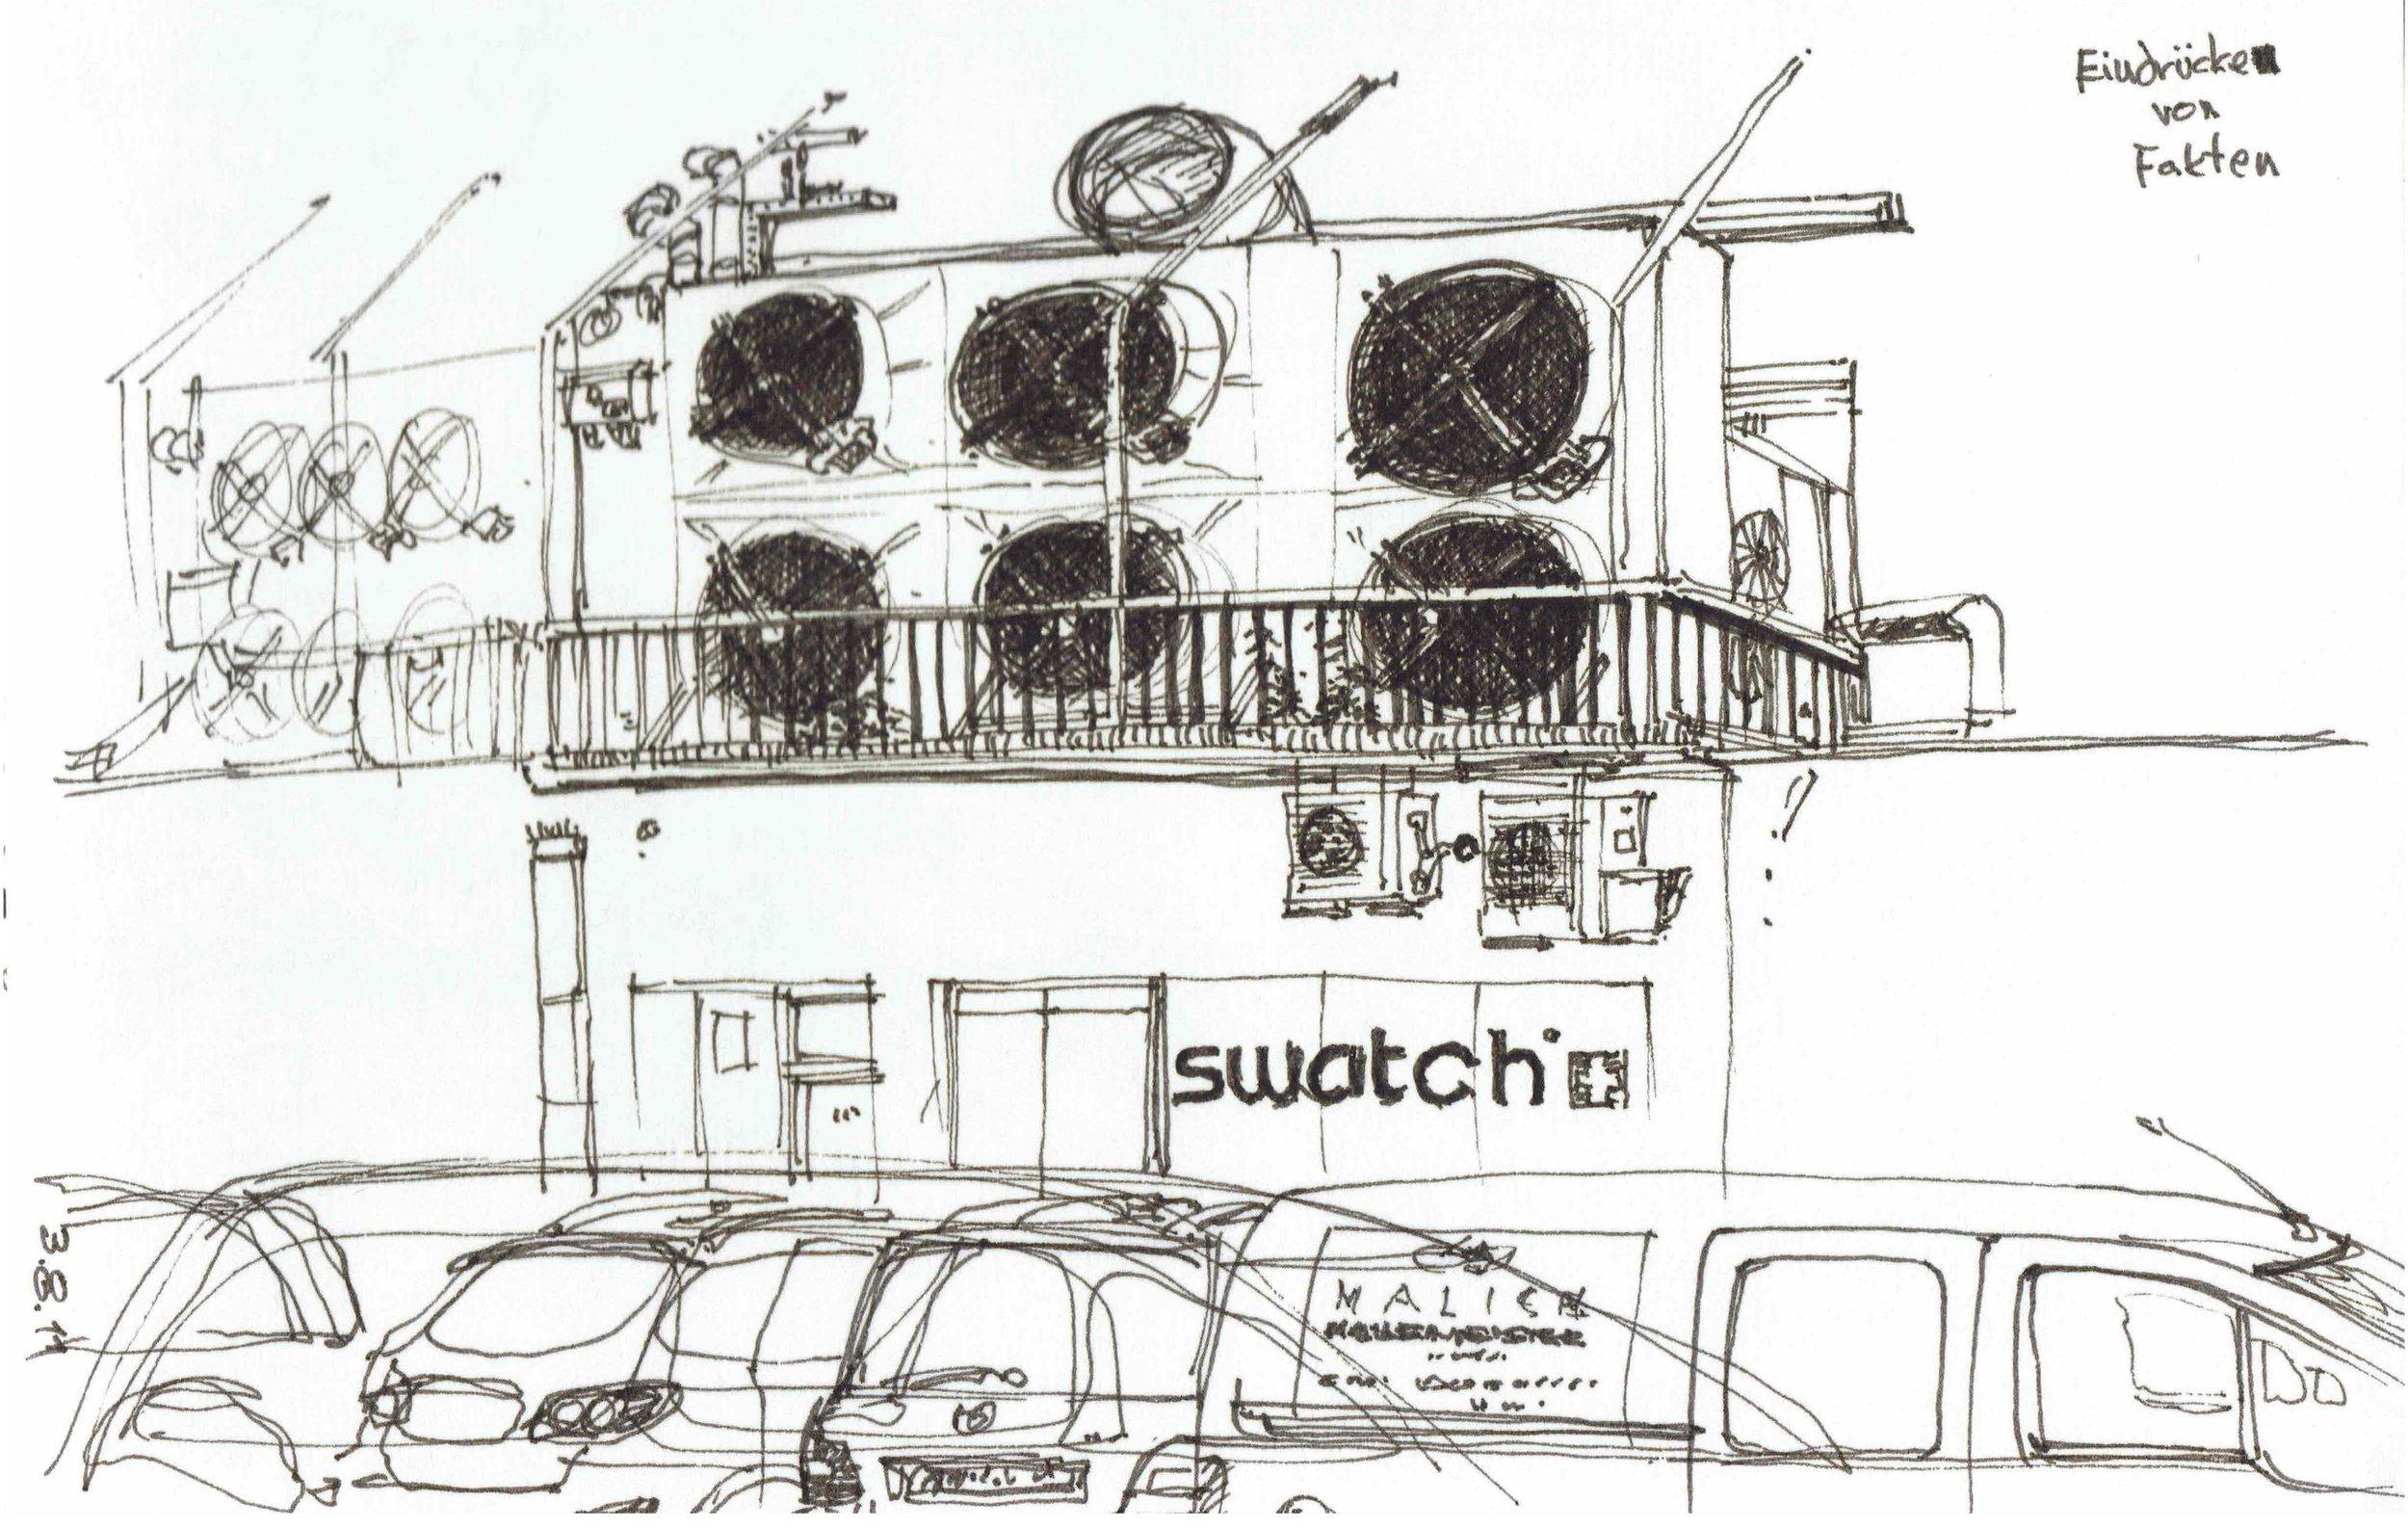 swatch parking lot.jpg